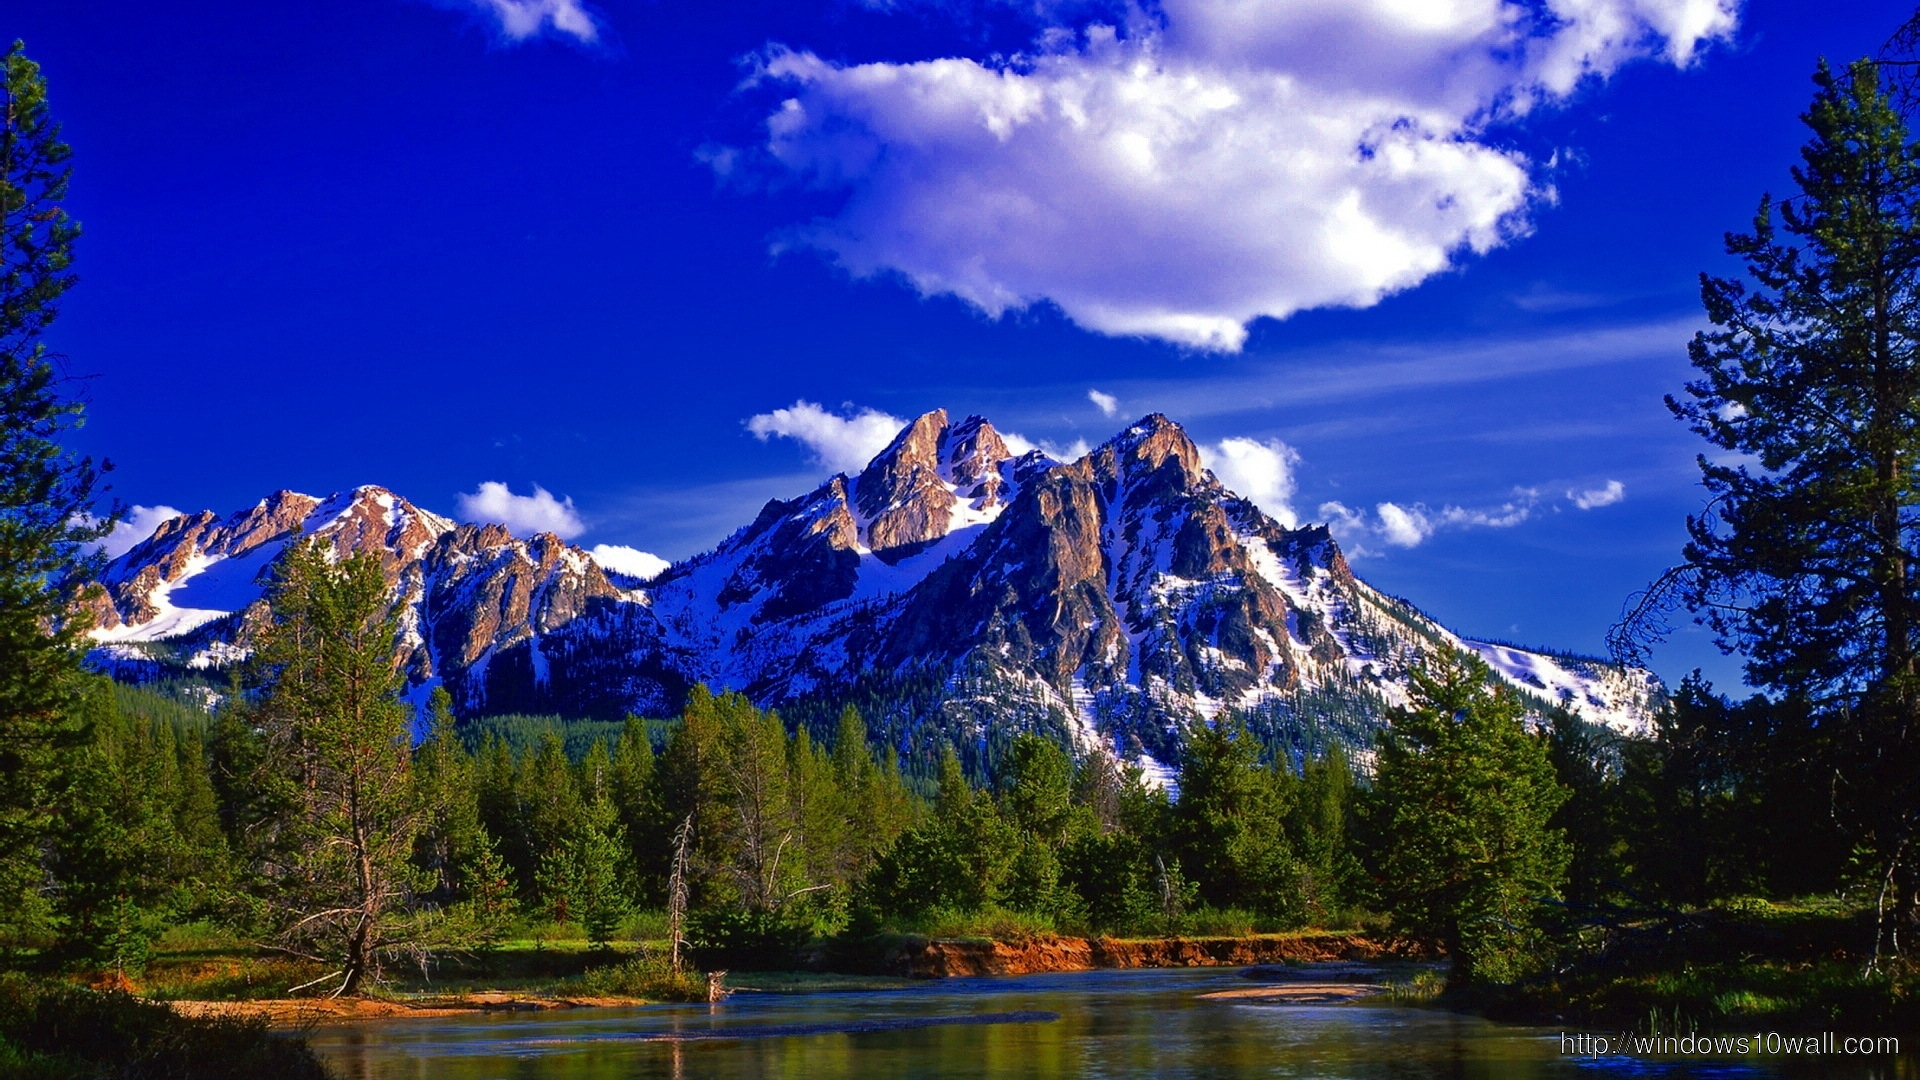 Mountain Nature Blue Sky Wallpaper - windows 10 Wallpapers